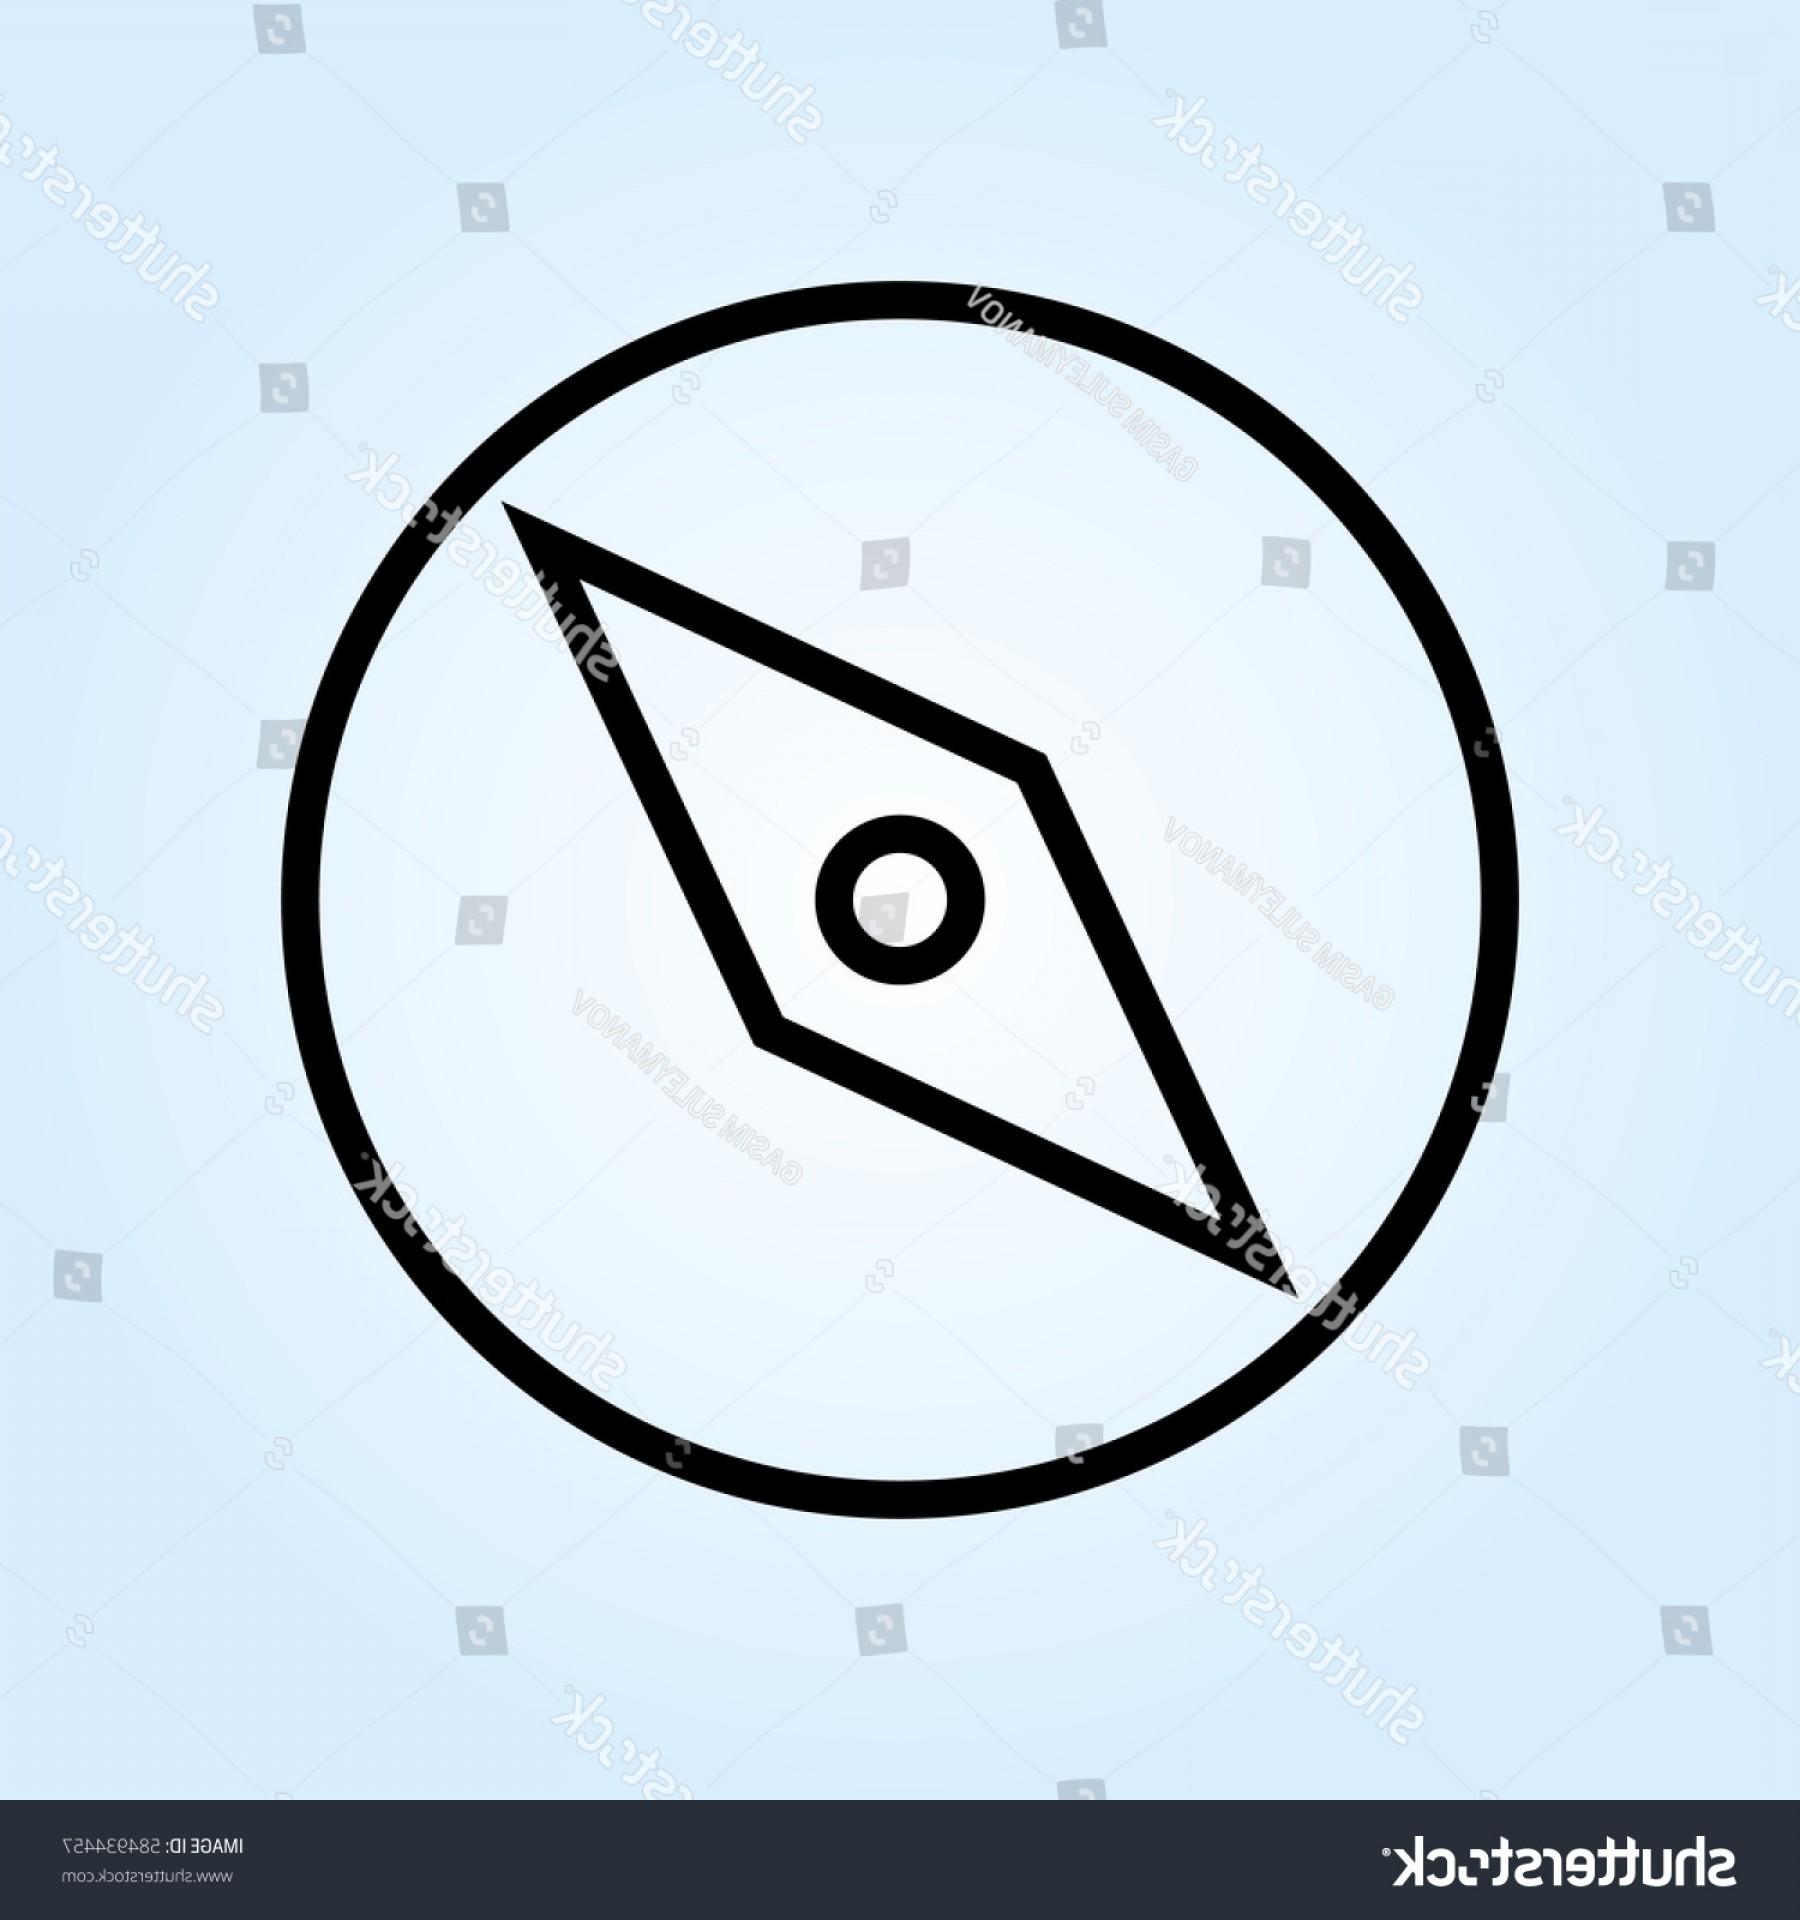 1800x1920 Tumblr Explore Icon Vector Compas Isolated Arenawp